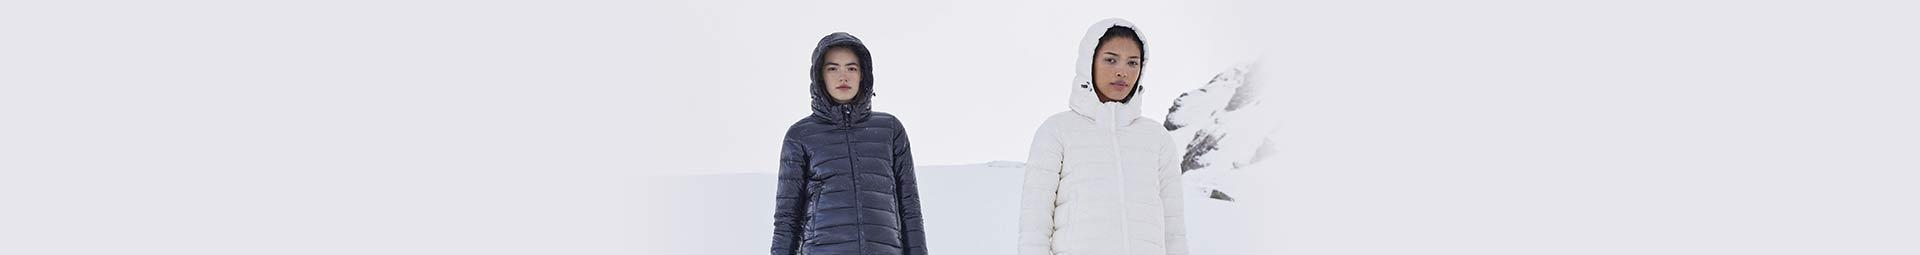 Autumn / winter women collection | Warm down jackets & parkas | Pyrenex